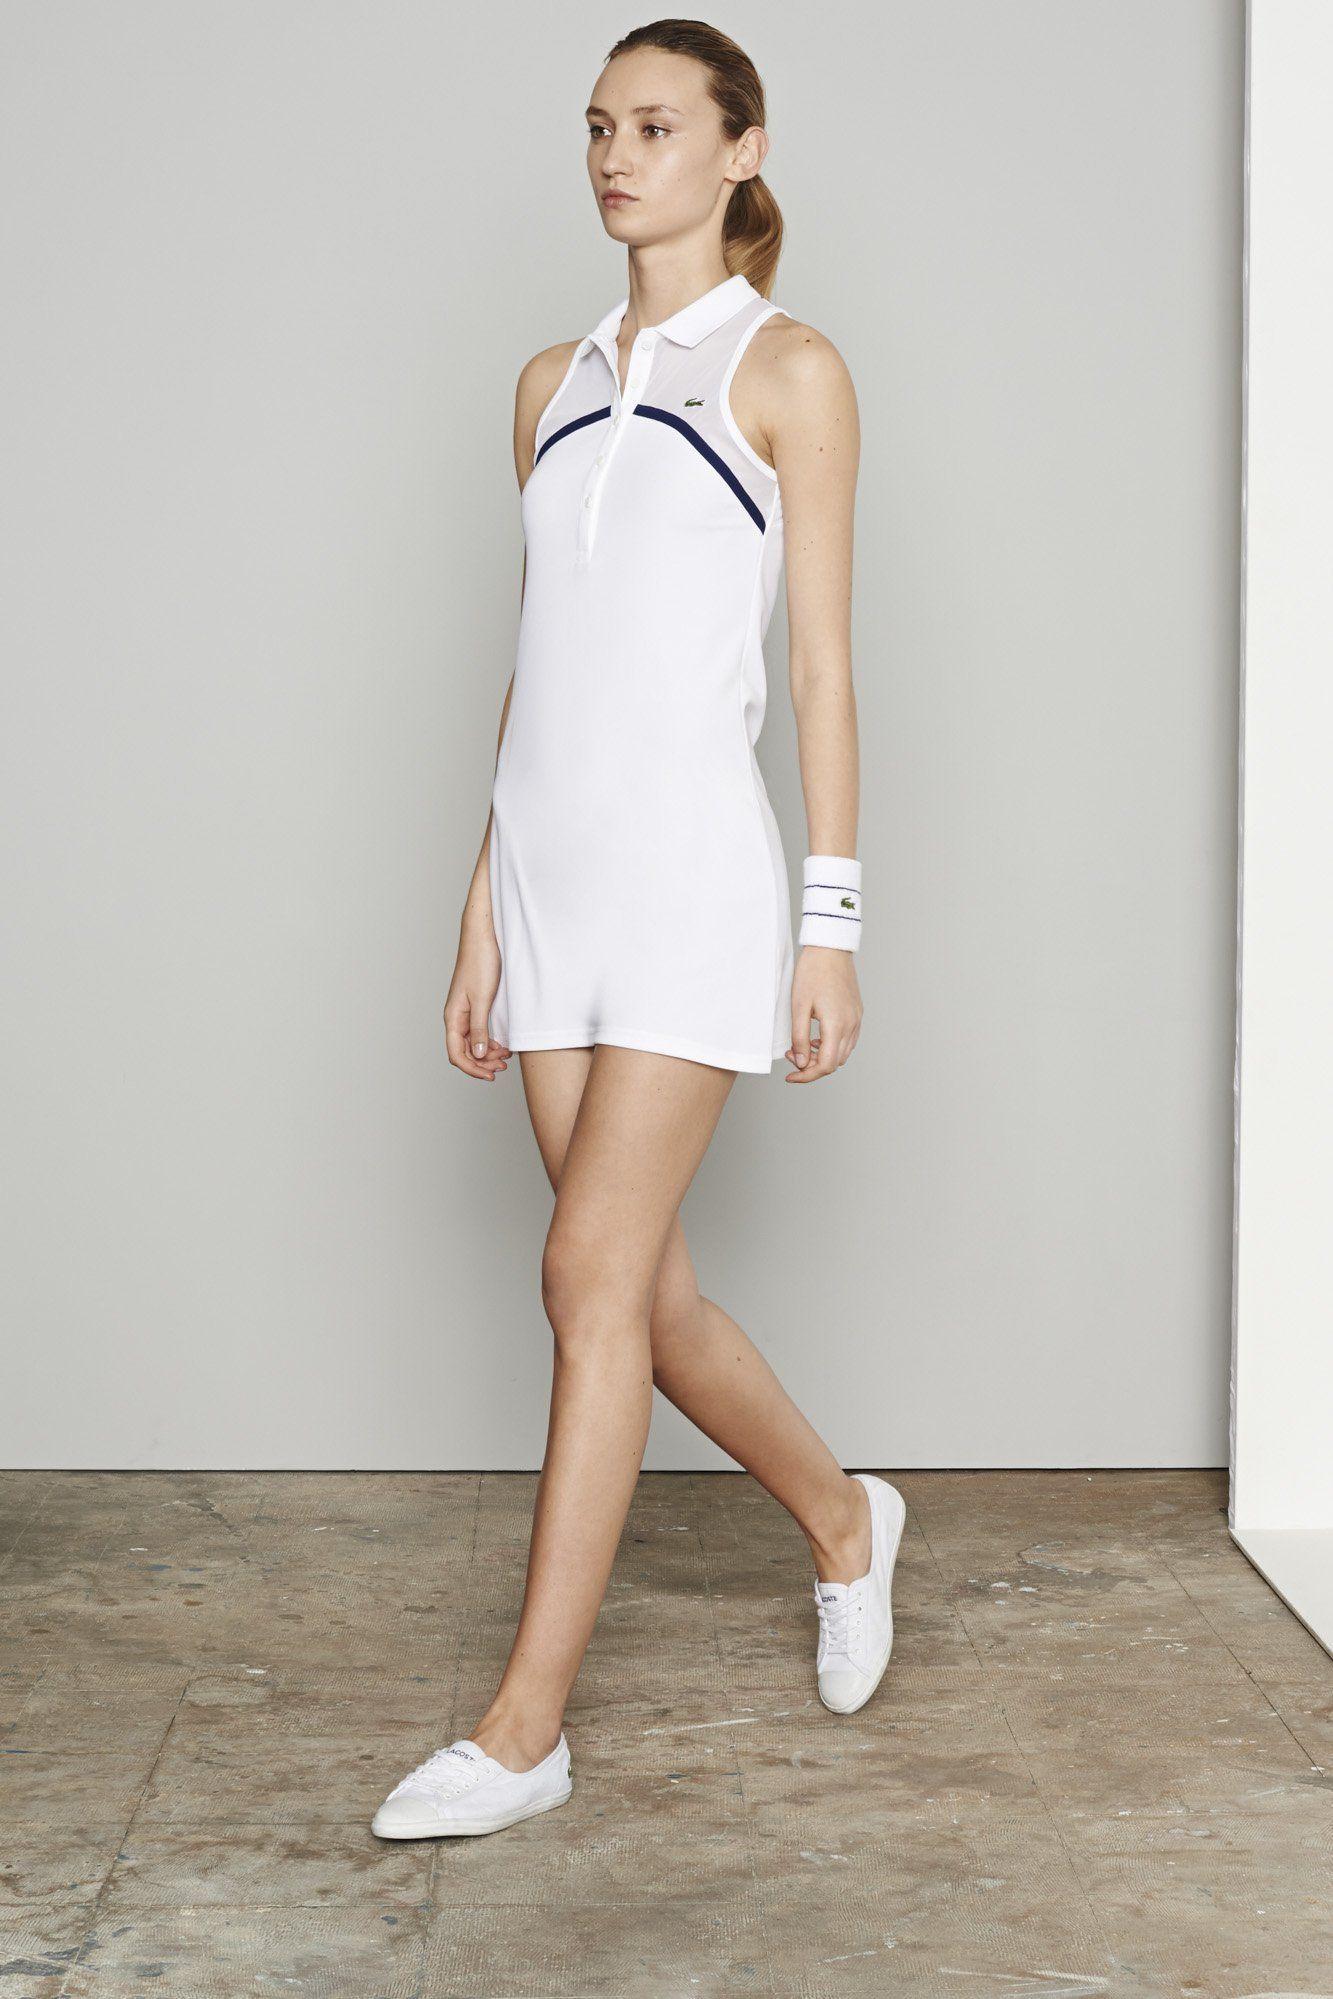 Sites Flagship Site Tennis Dress Fashion Lacoste Dress Lacoste Tennis Dress